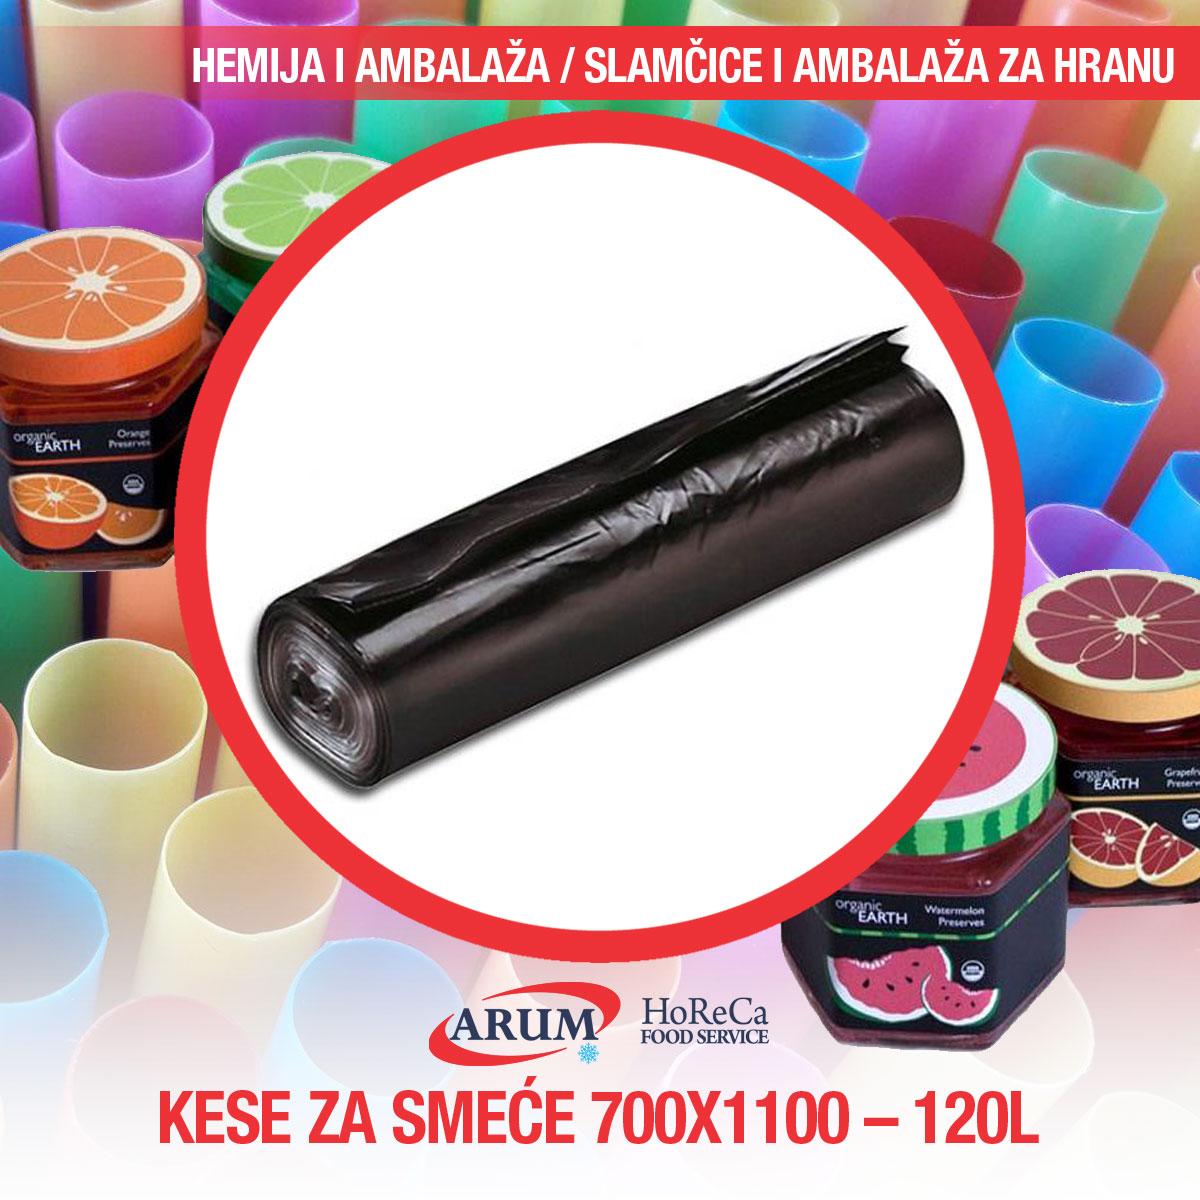 Kese za smece 700*1100 - 120l